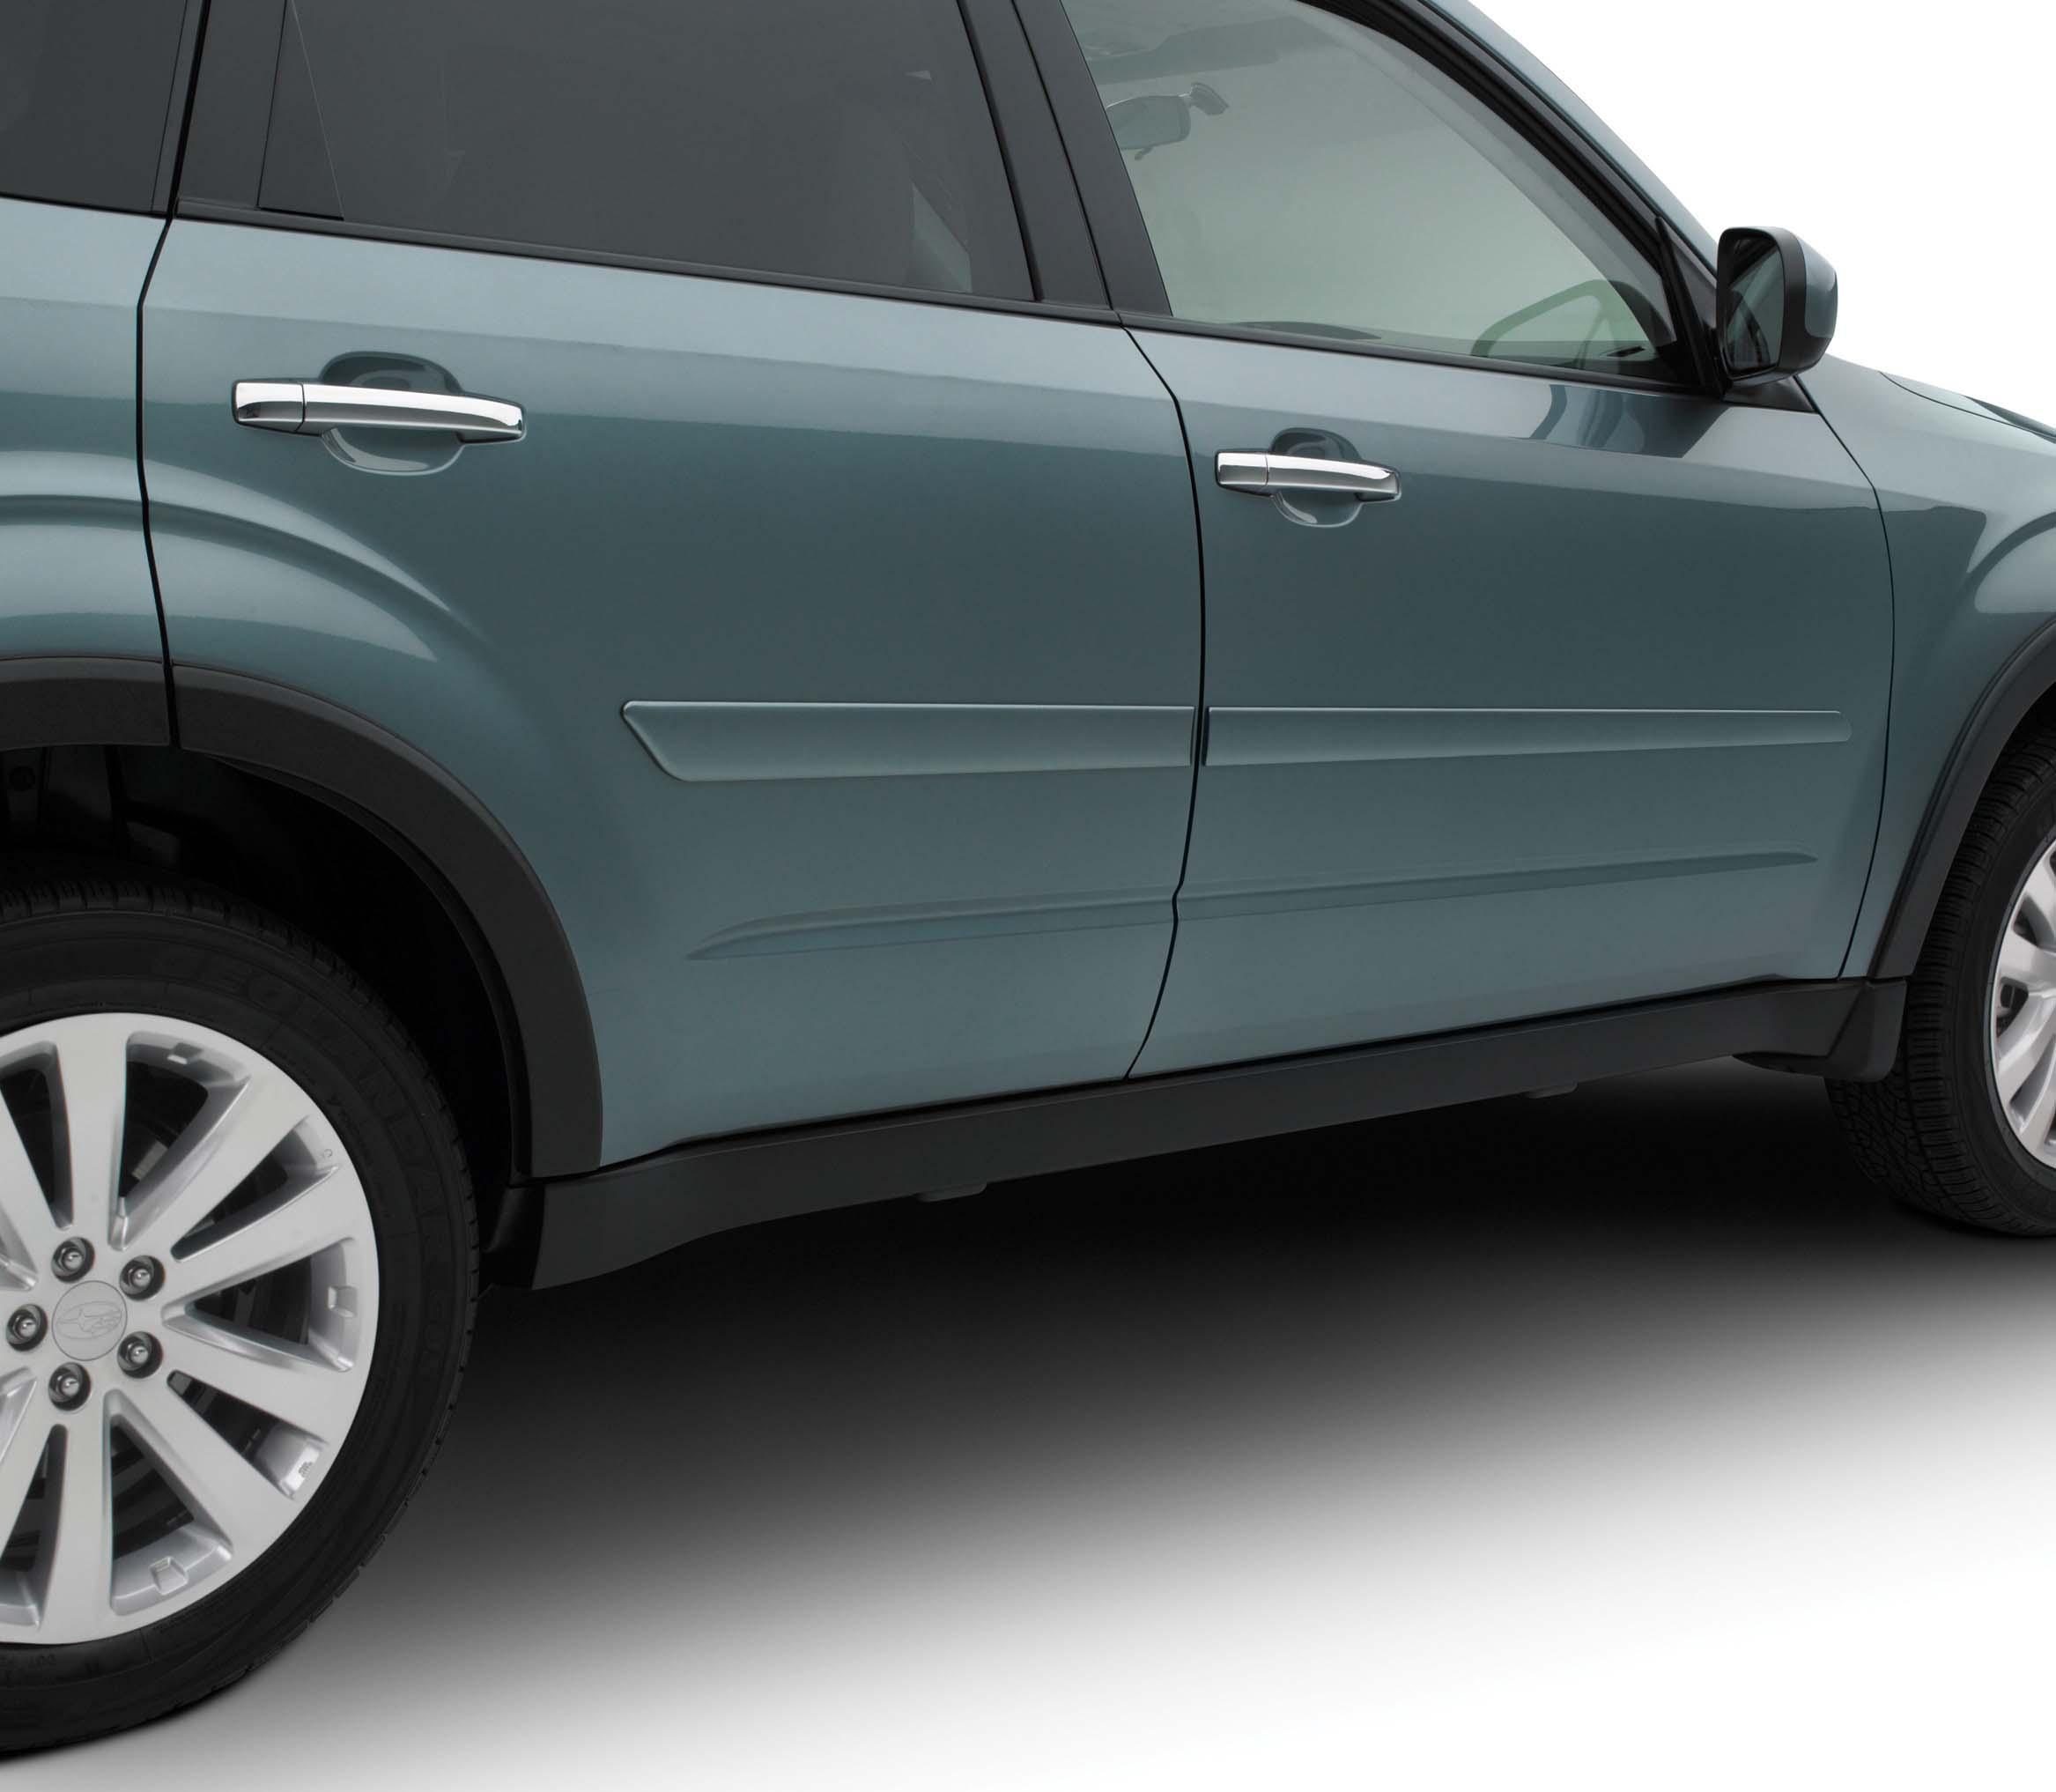 Subaru Forester Body Side Molding Kit Metallic Pearl